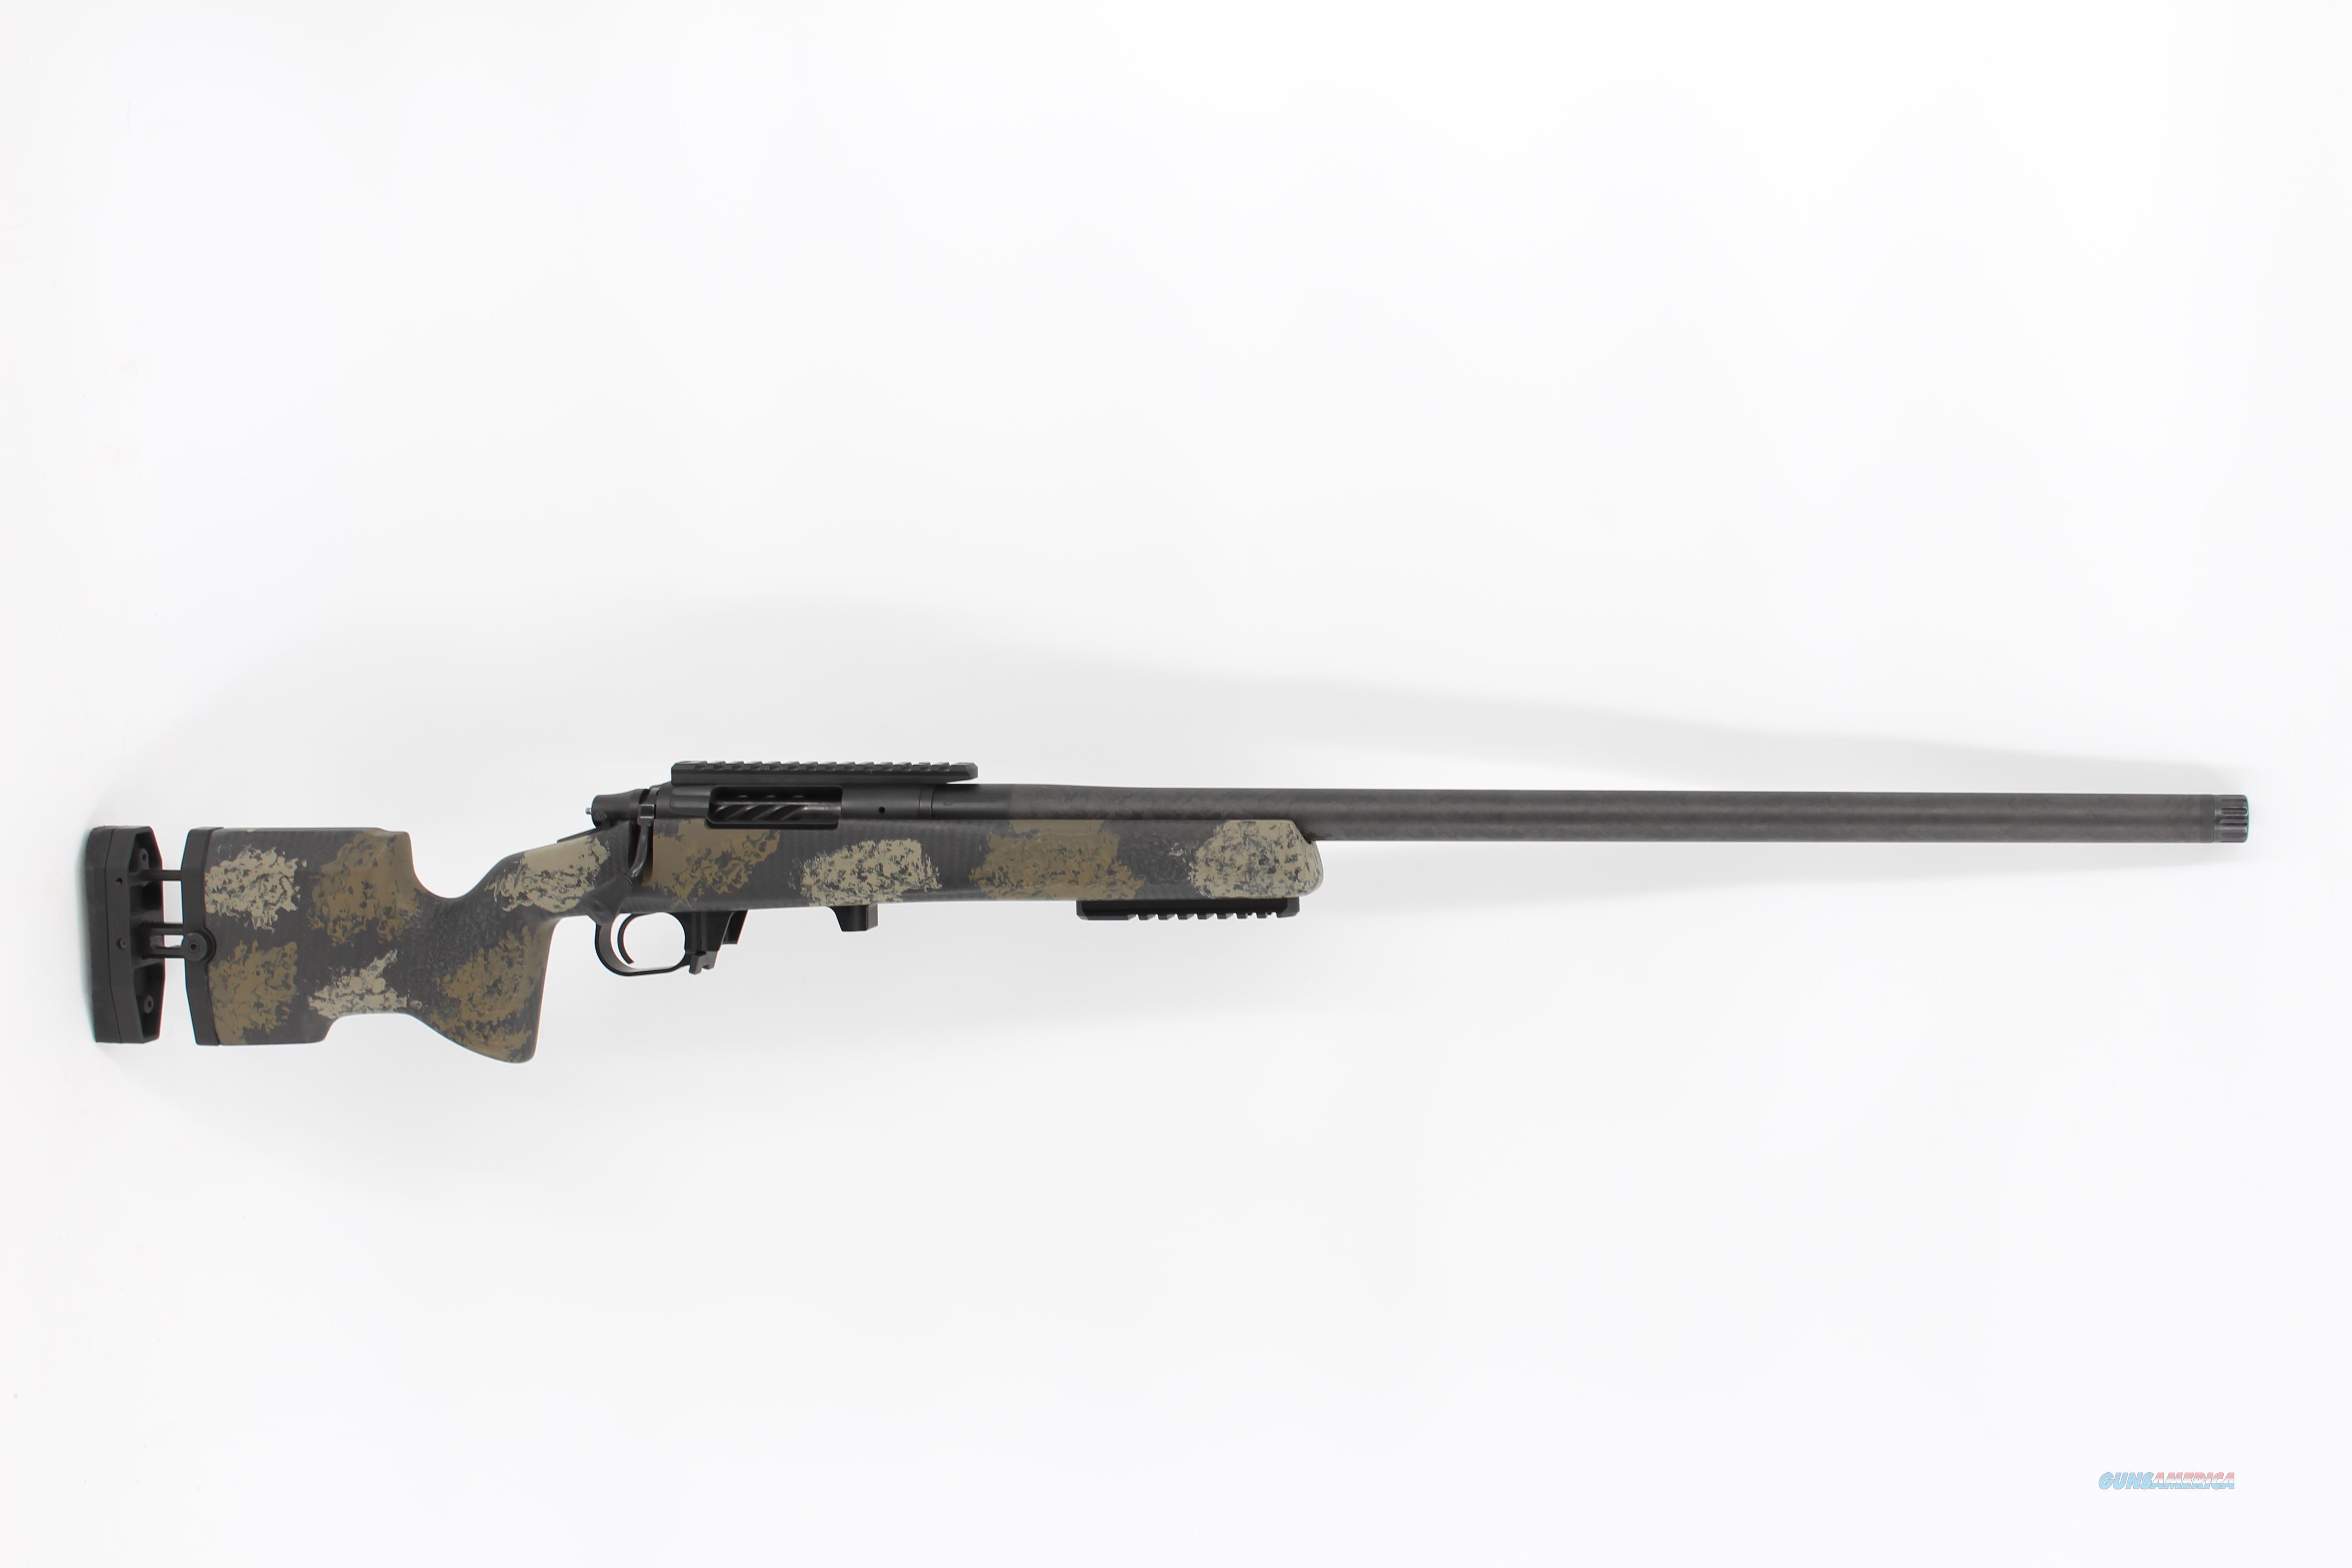 TS Customs Mack Bros Evo Titanium 6.5 PRC Proof Research  Guns > Rifles > MN Misc Rifles